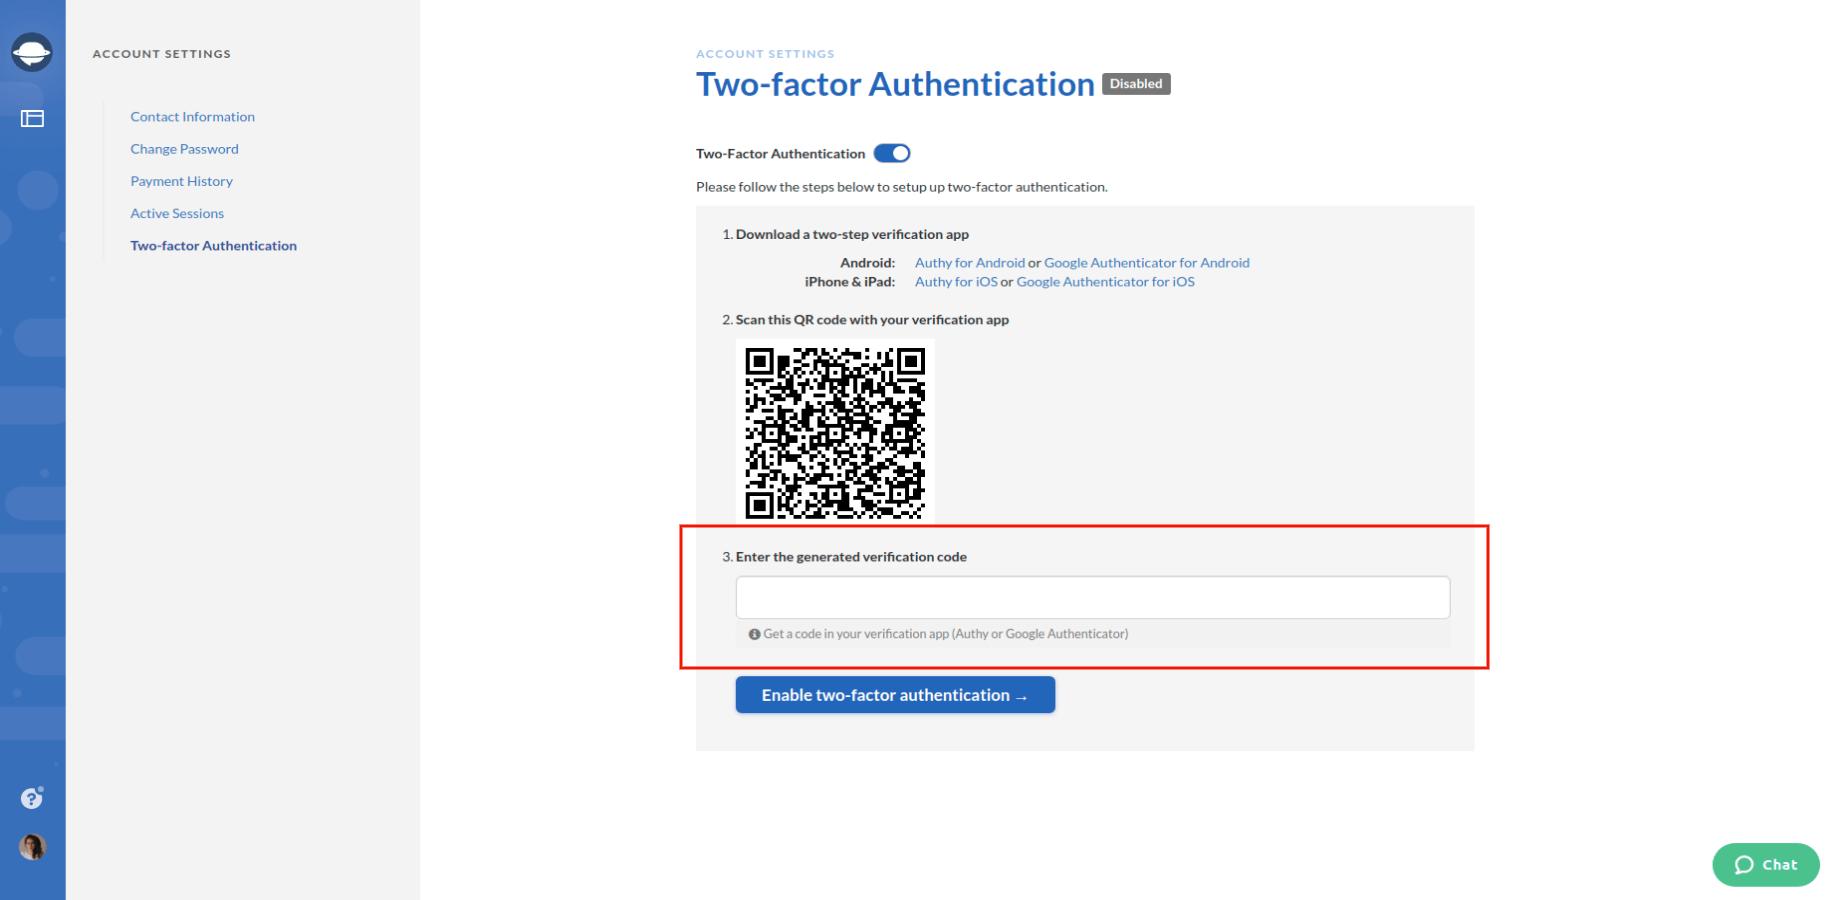 Enter the Verification Code